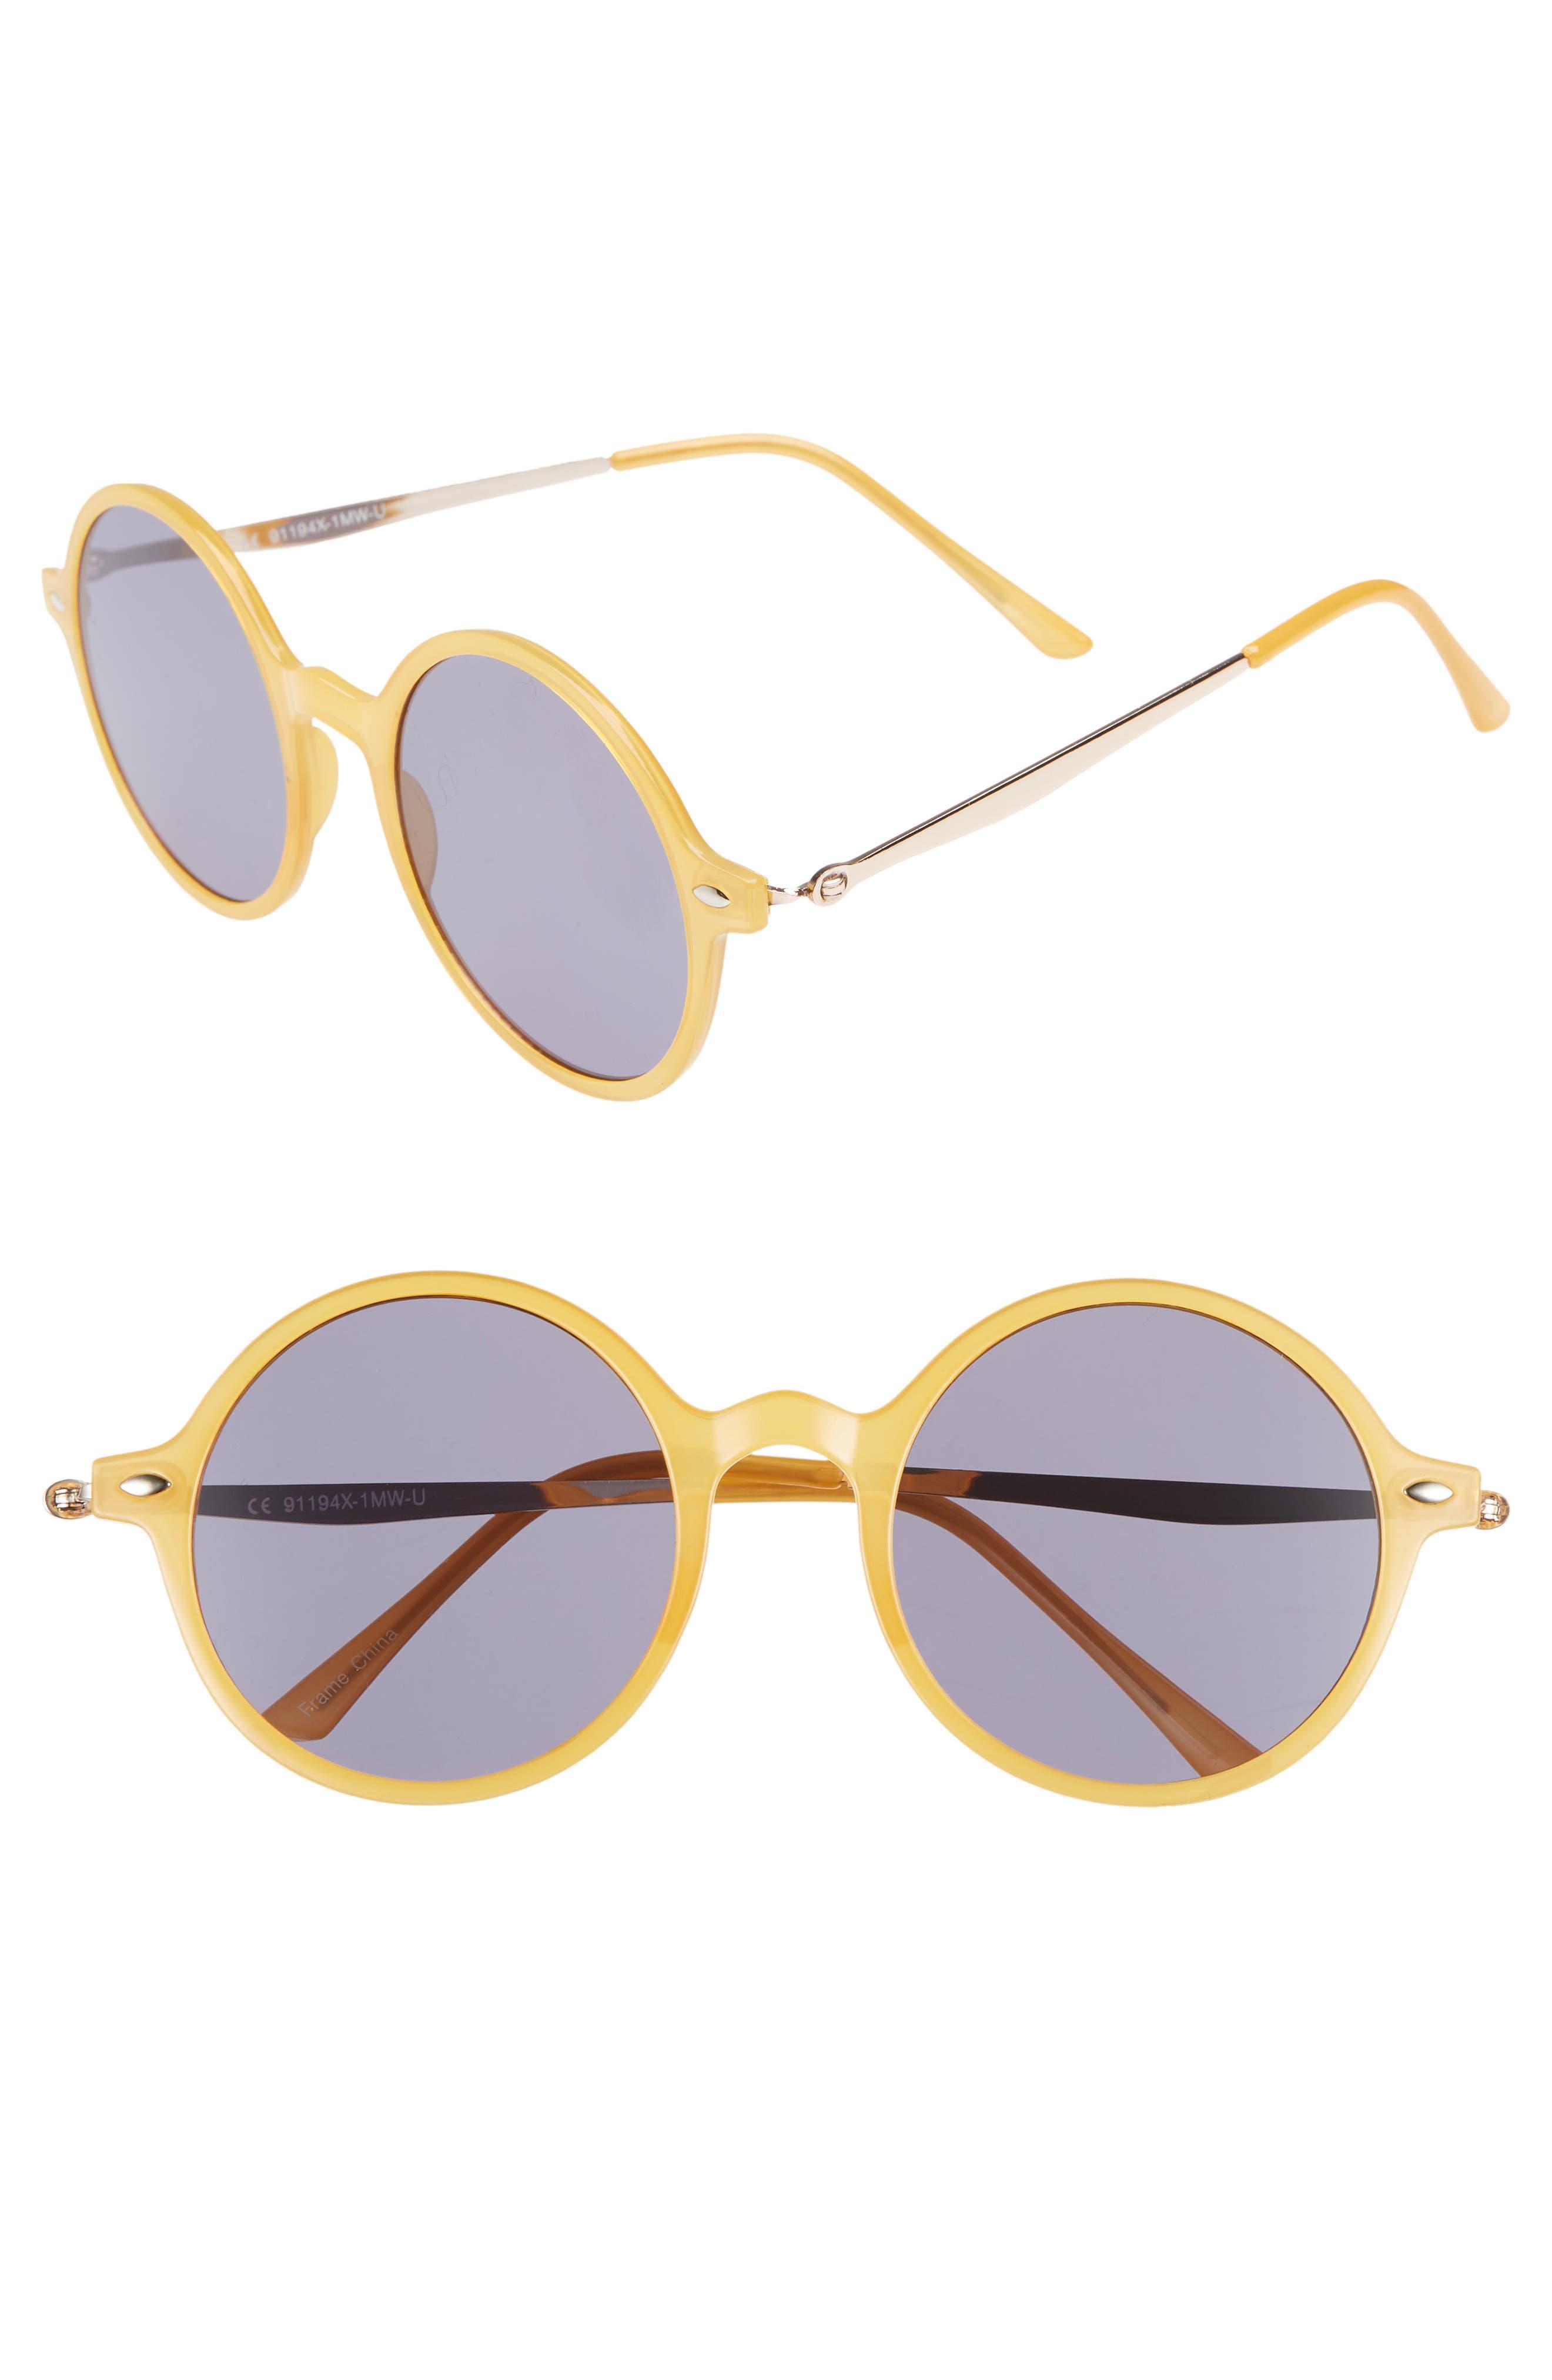 48mm Round Mixed Media Sunglasses,                         Main,                         color, NAVY/ YELLOW